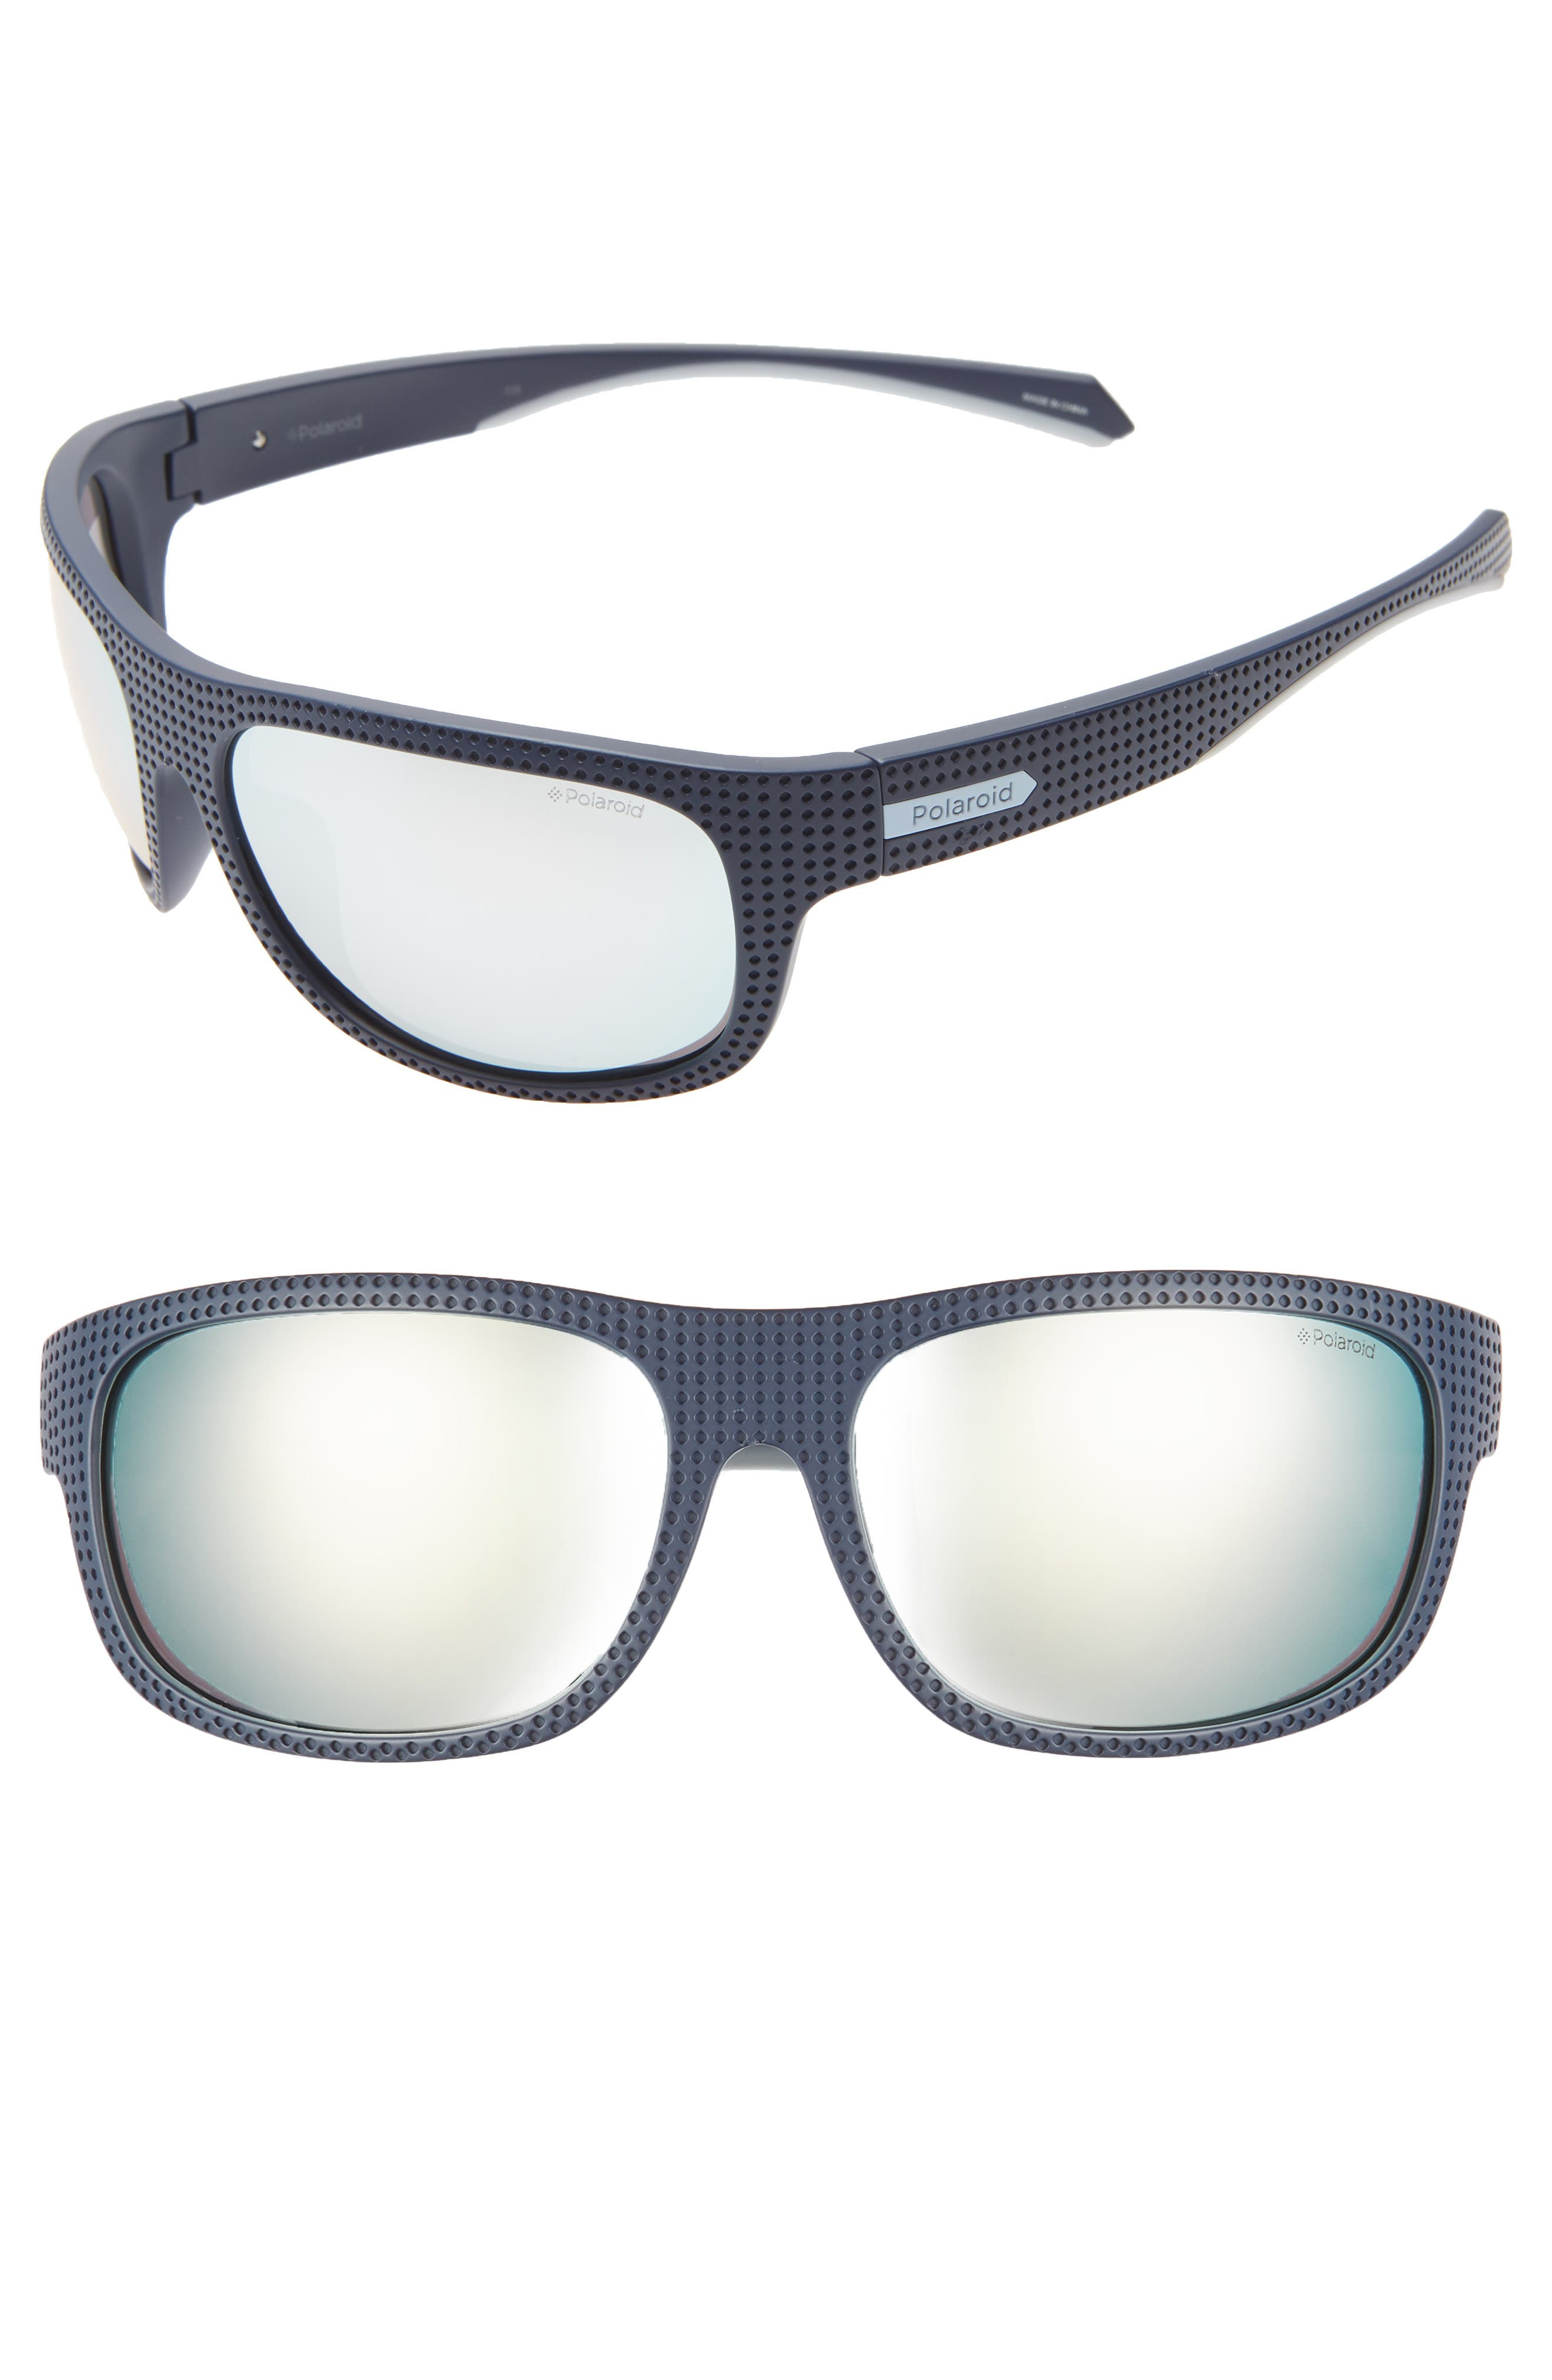 POLAROID Plastic Wrap 63Mm Polarized Sunglasses - Blue